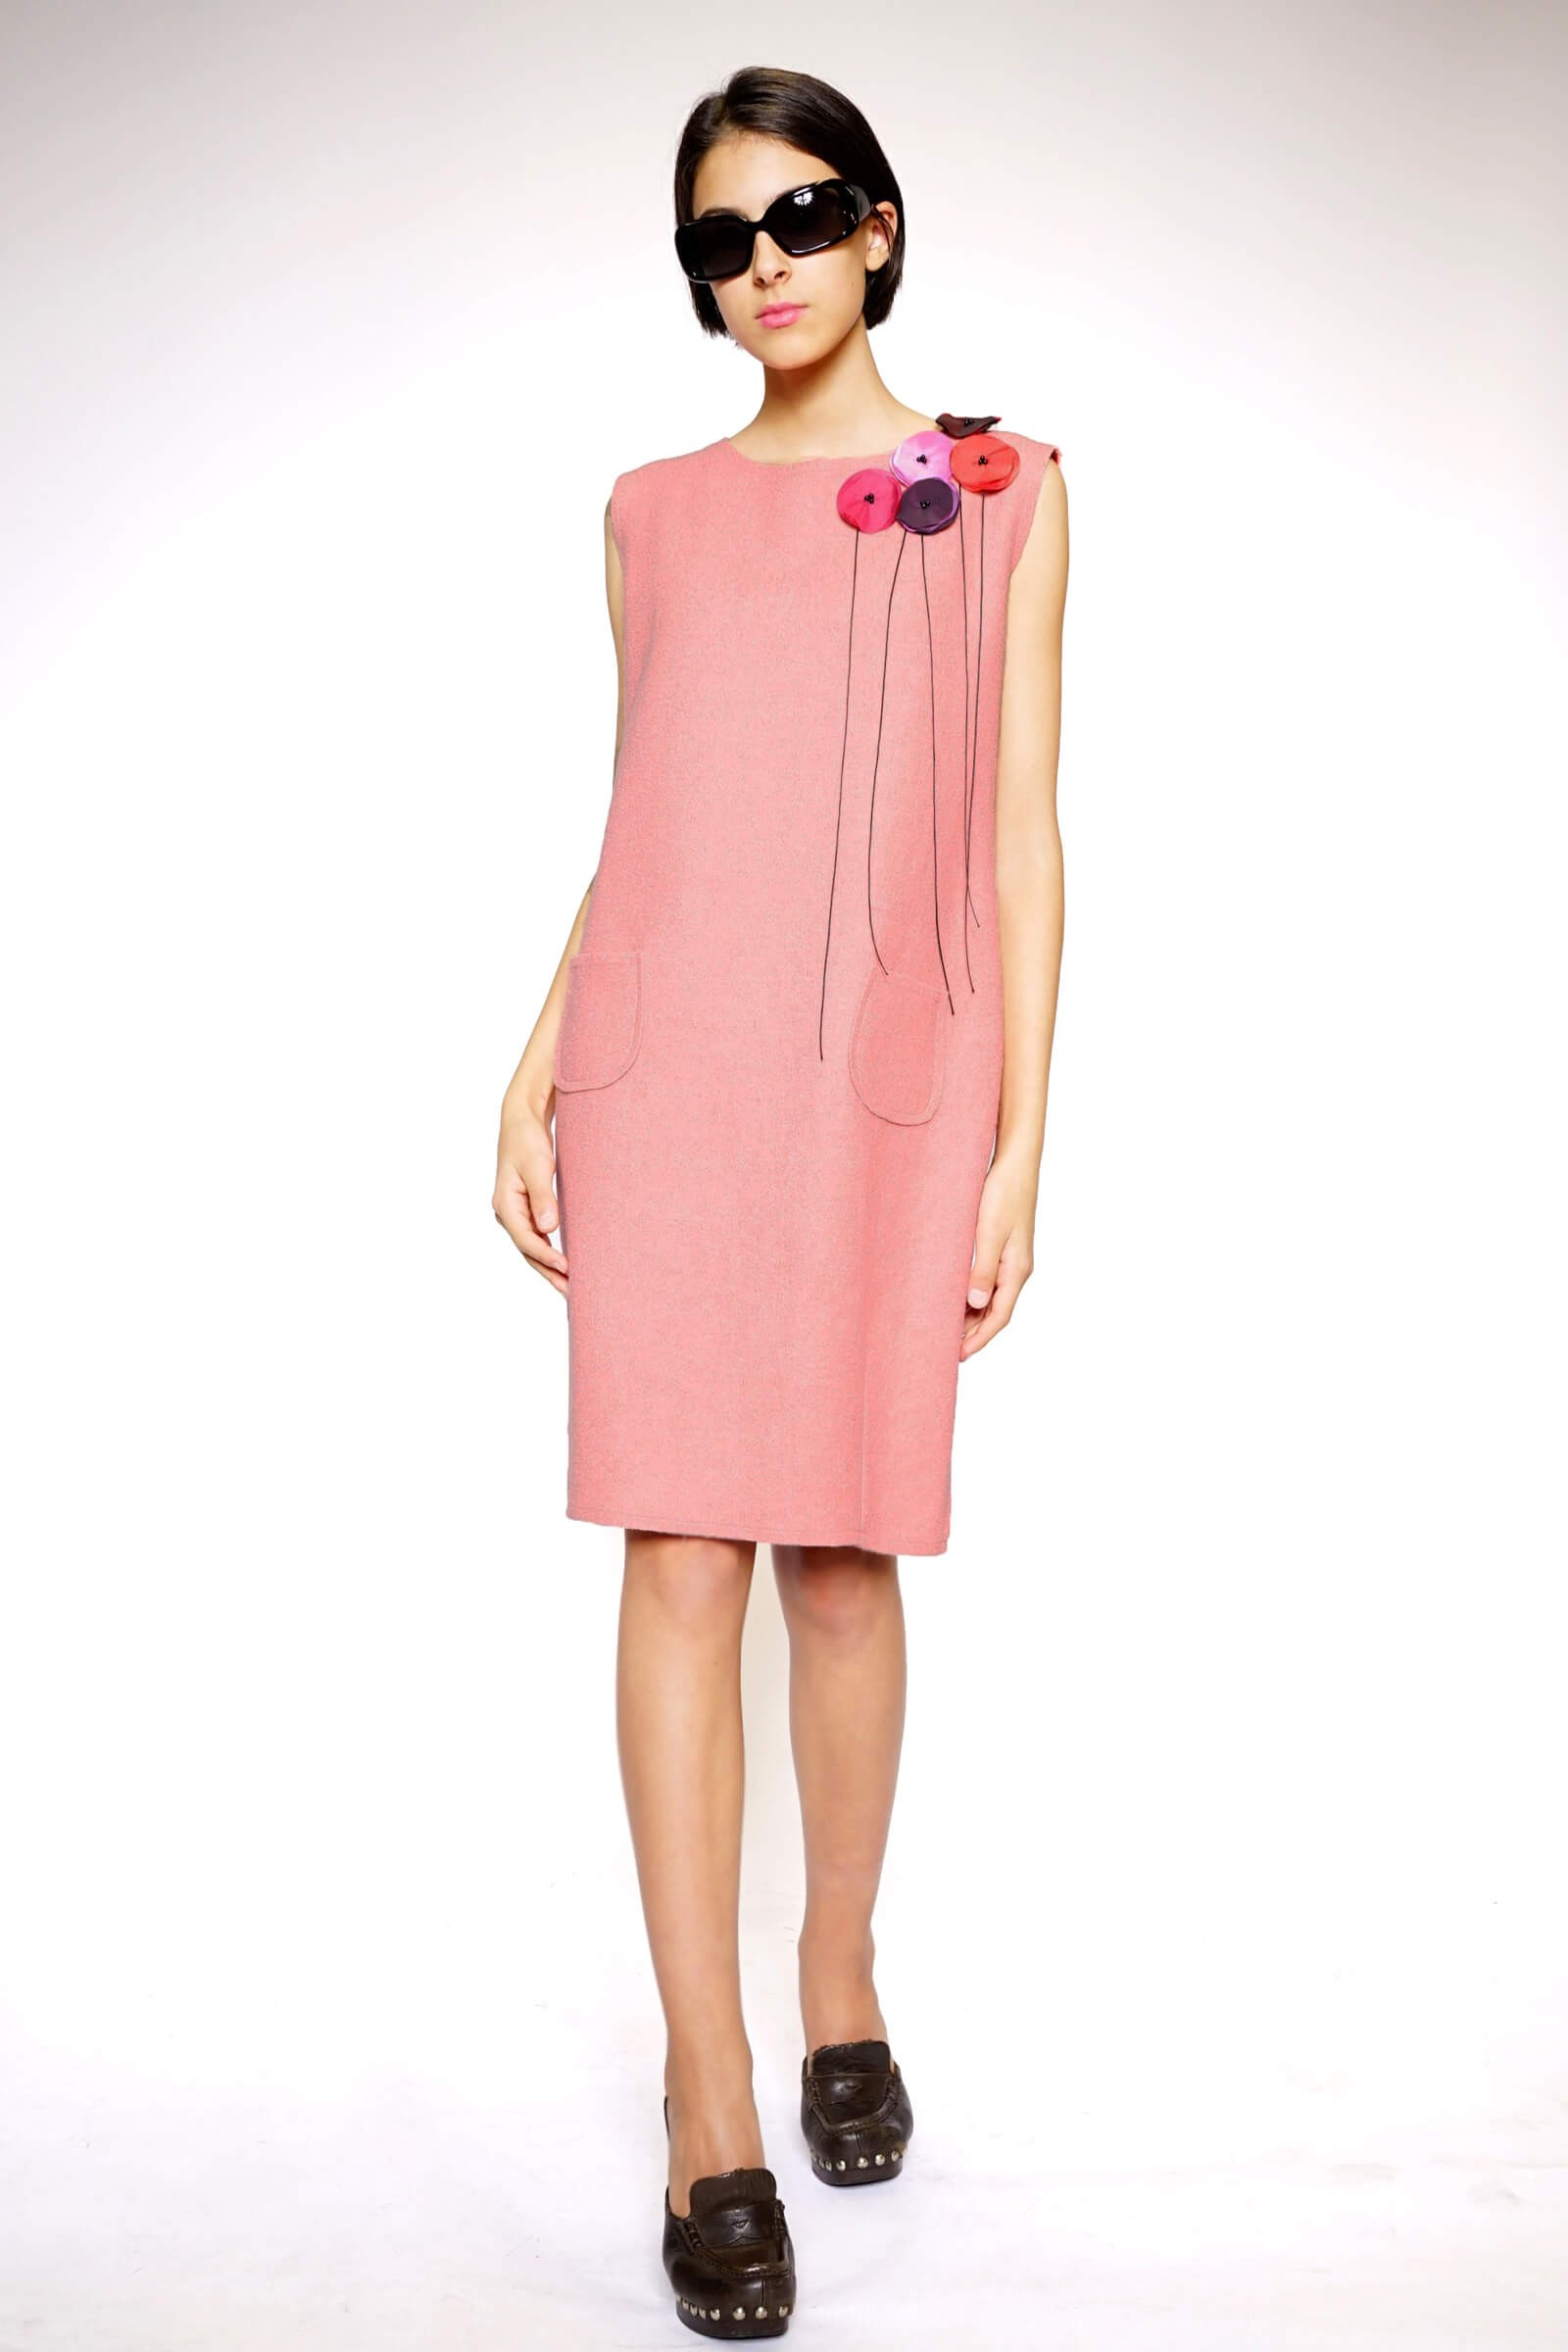 Pink wool dress